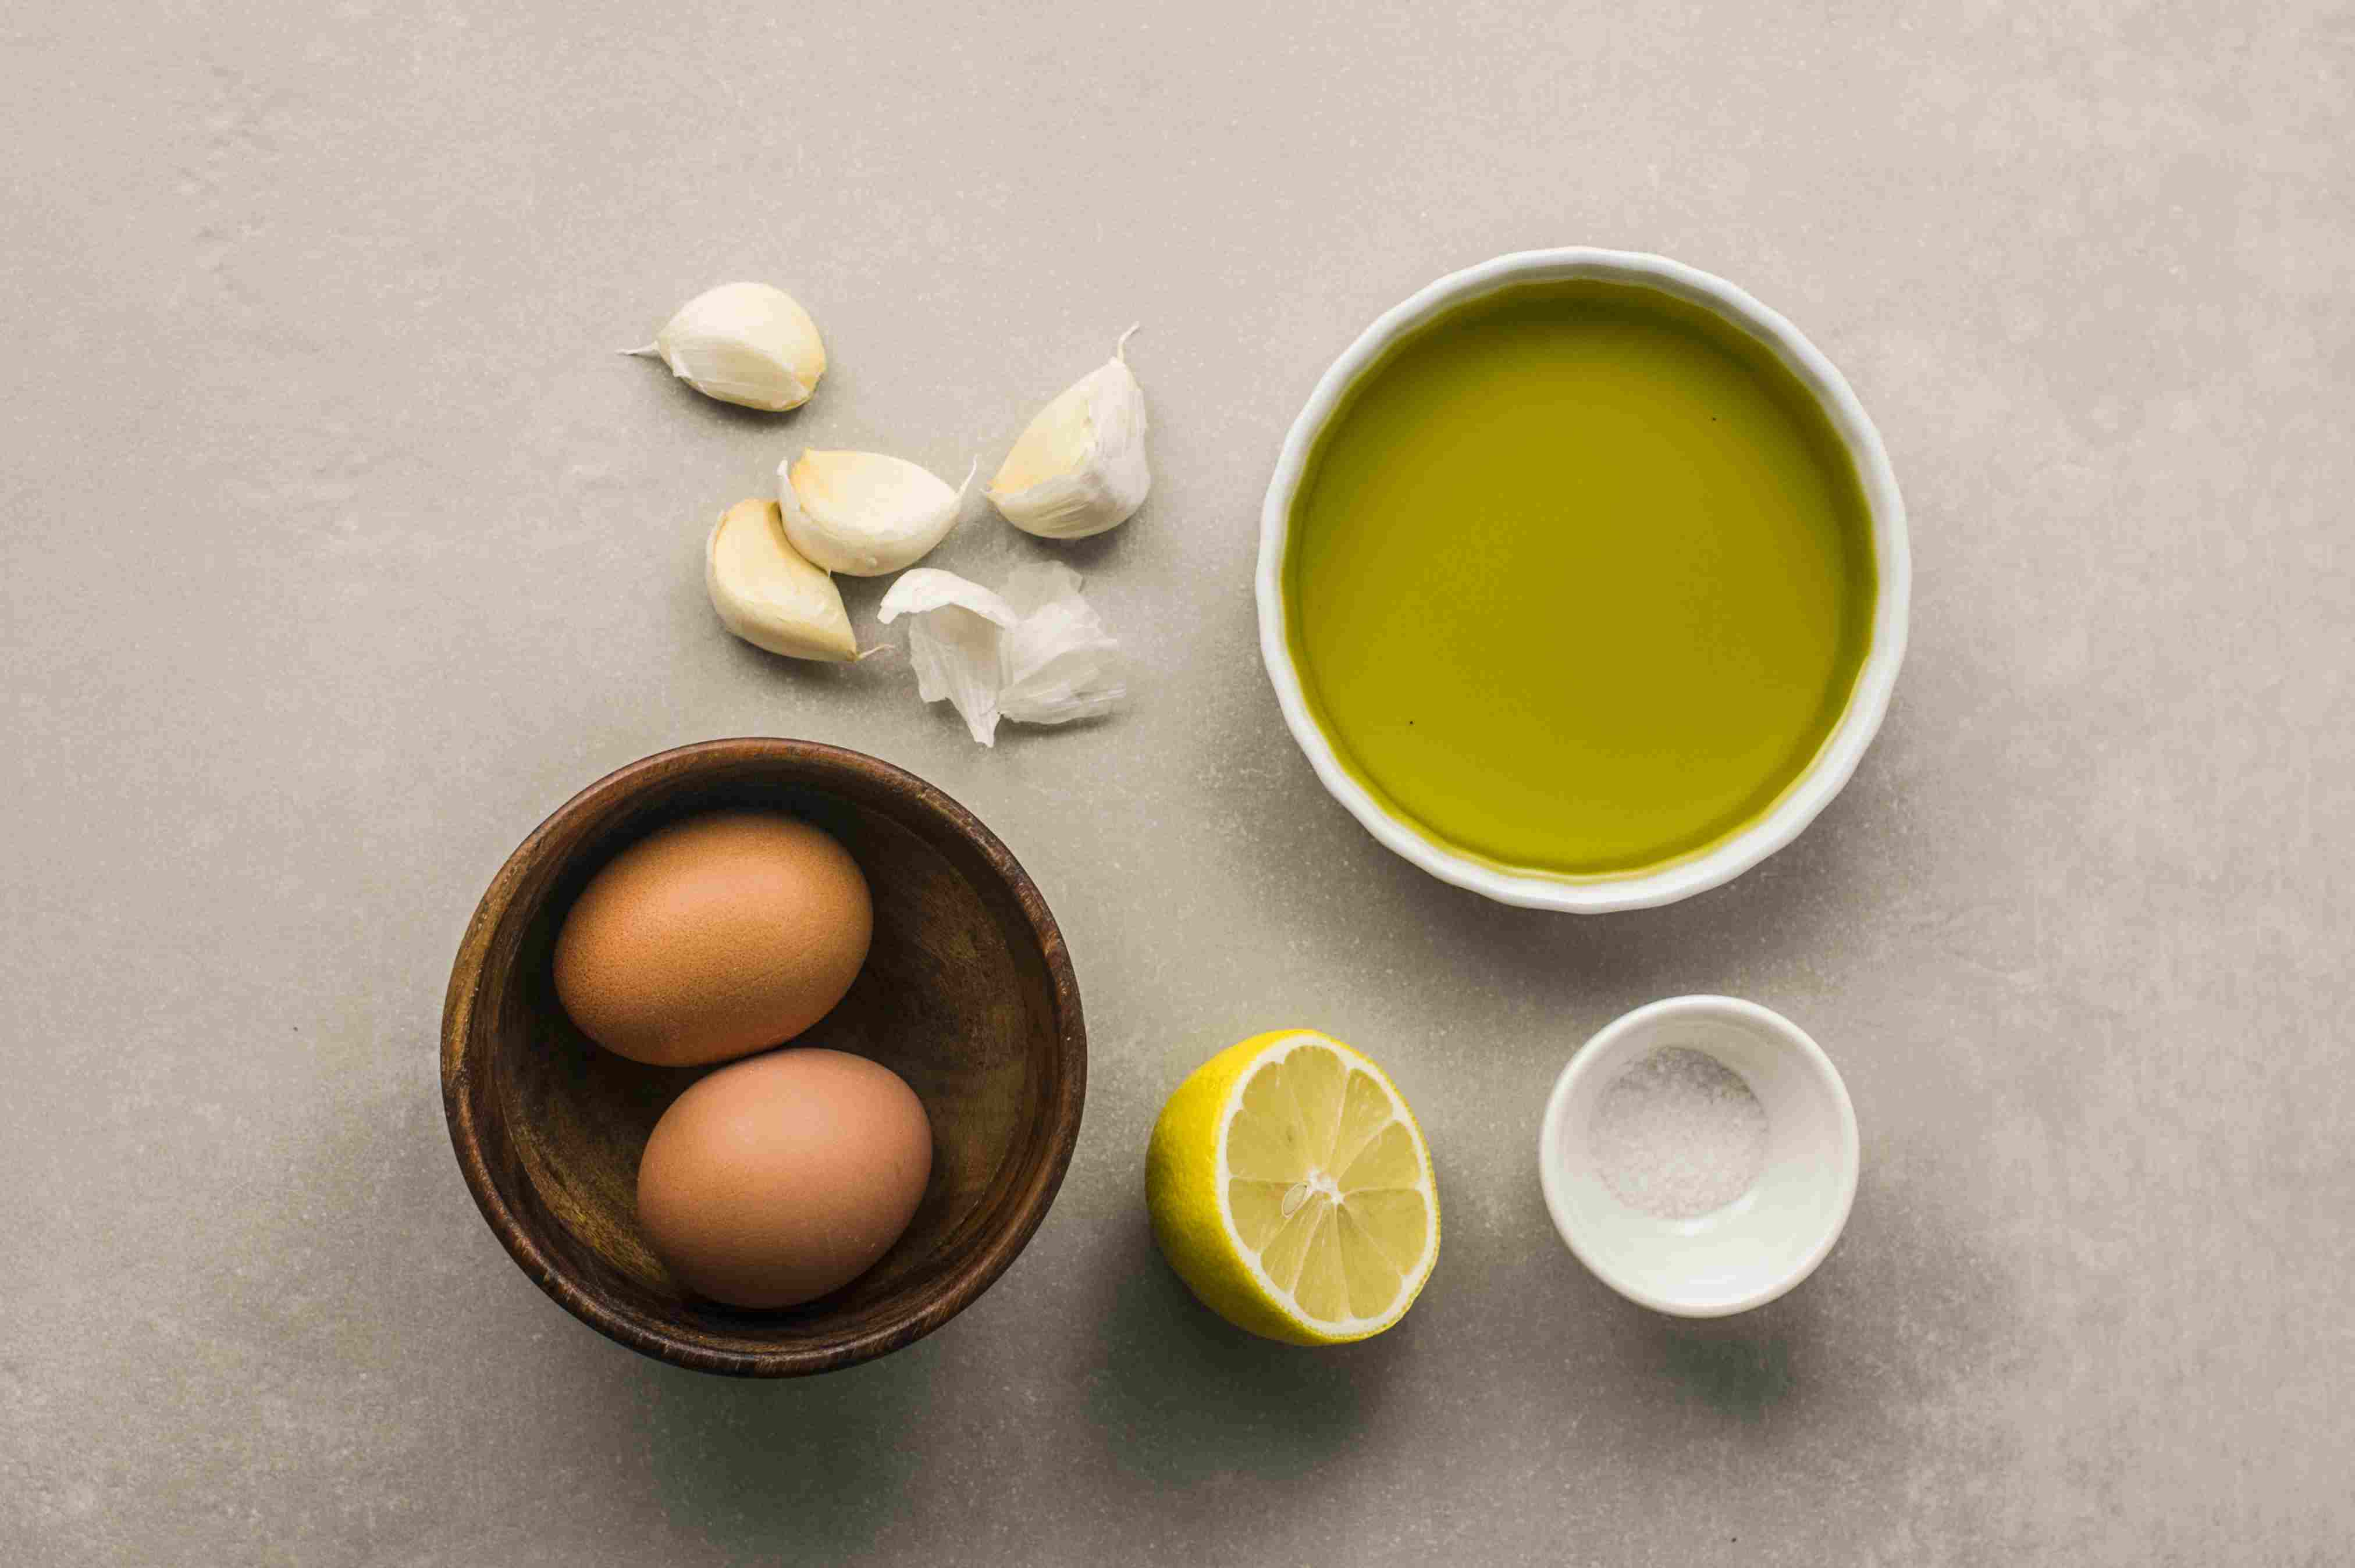 Ingredients for Spanish garlic mayo